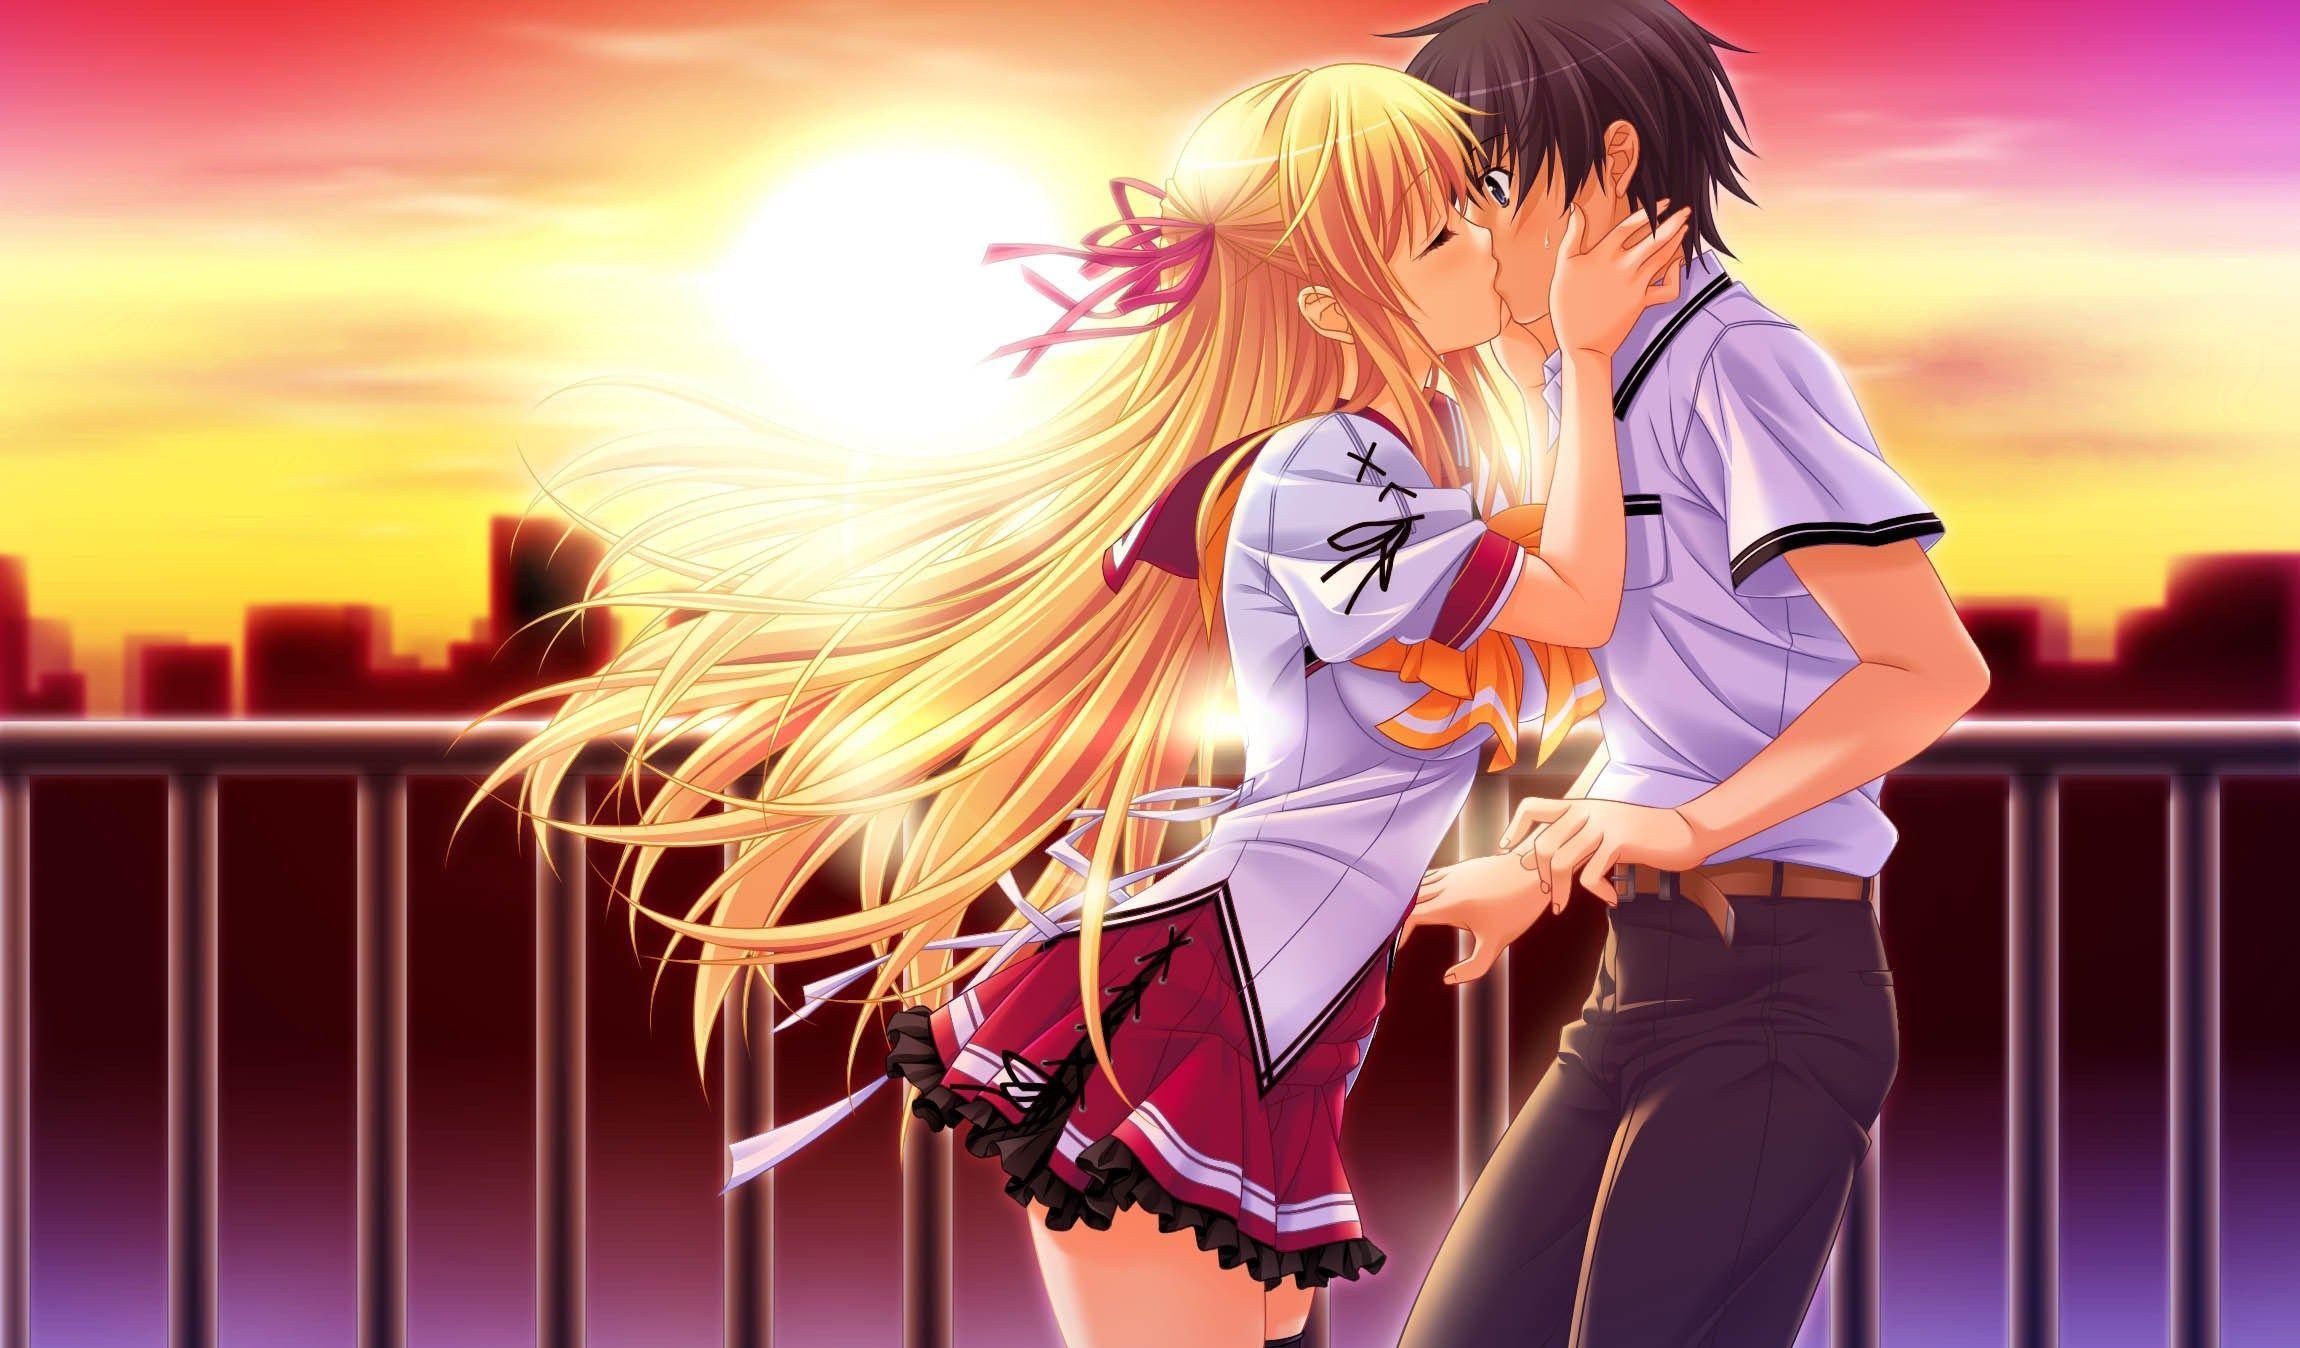 Anime Kiss Wallpapers Top Free Anime Kiss Backgrounds Wallpaperaccess Too passionate with his own girlfriend (amv kiss) #animekiss #simontok. anime kiss wallpapers top free anime